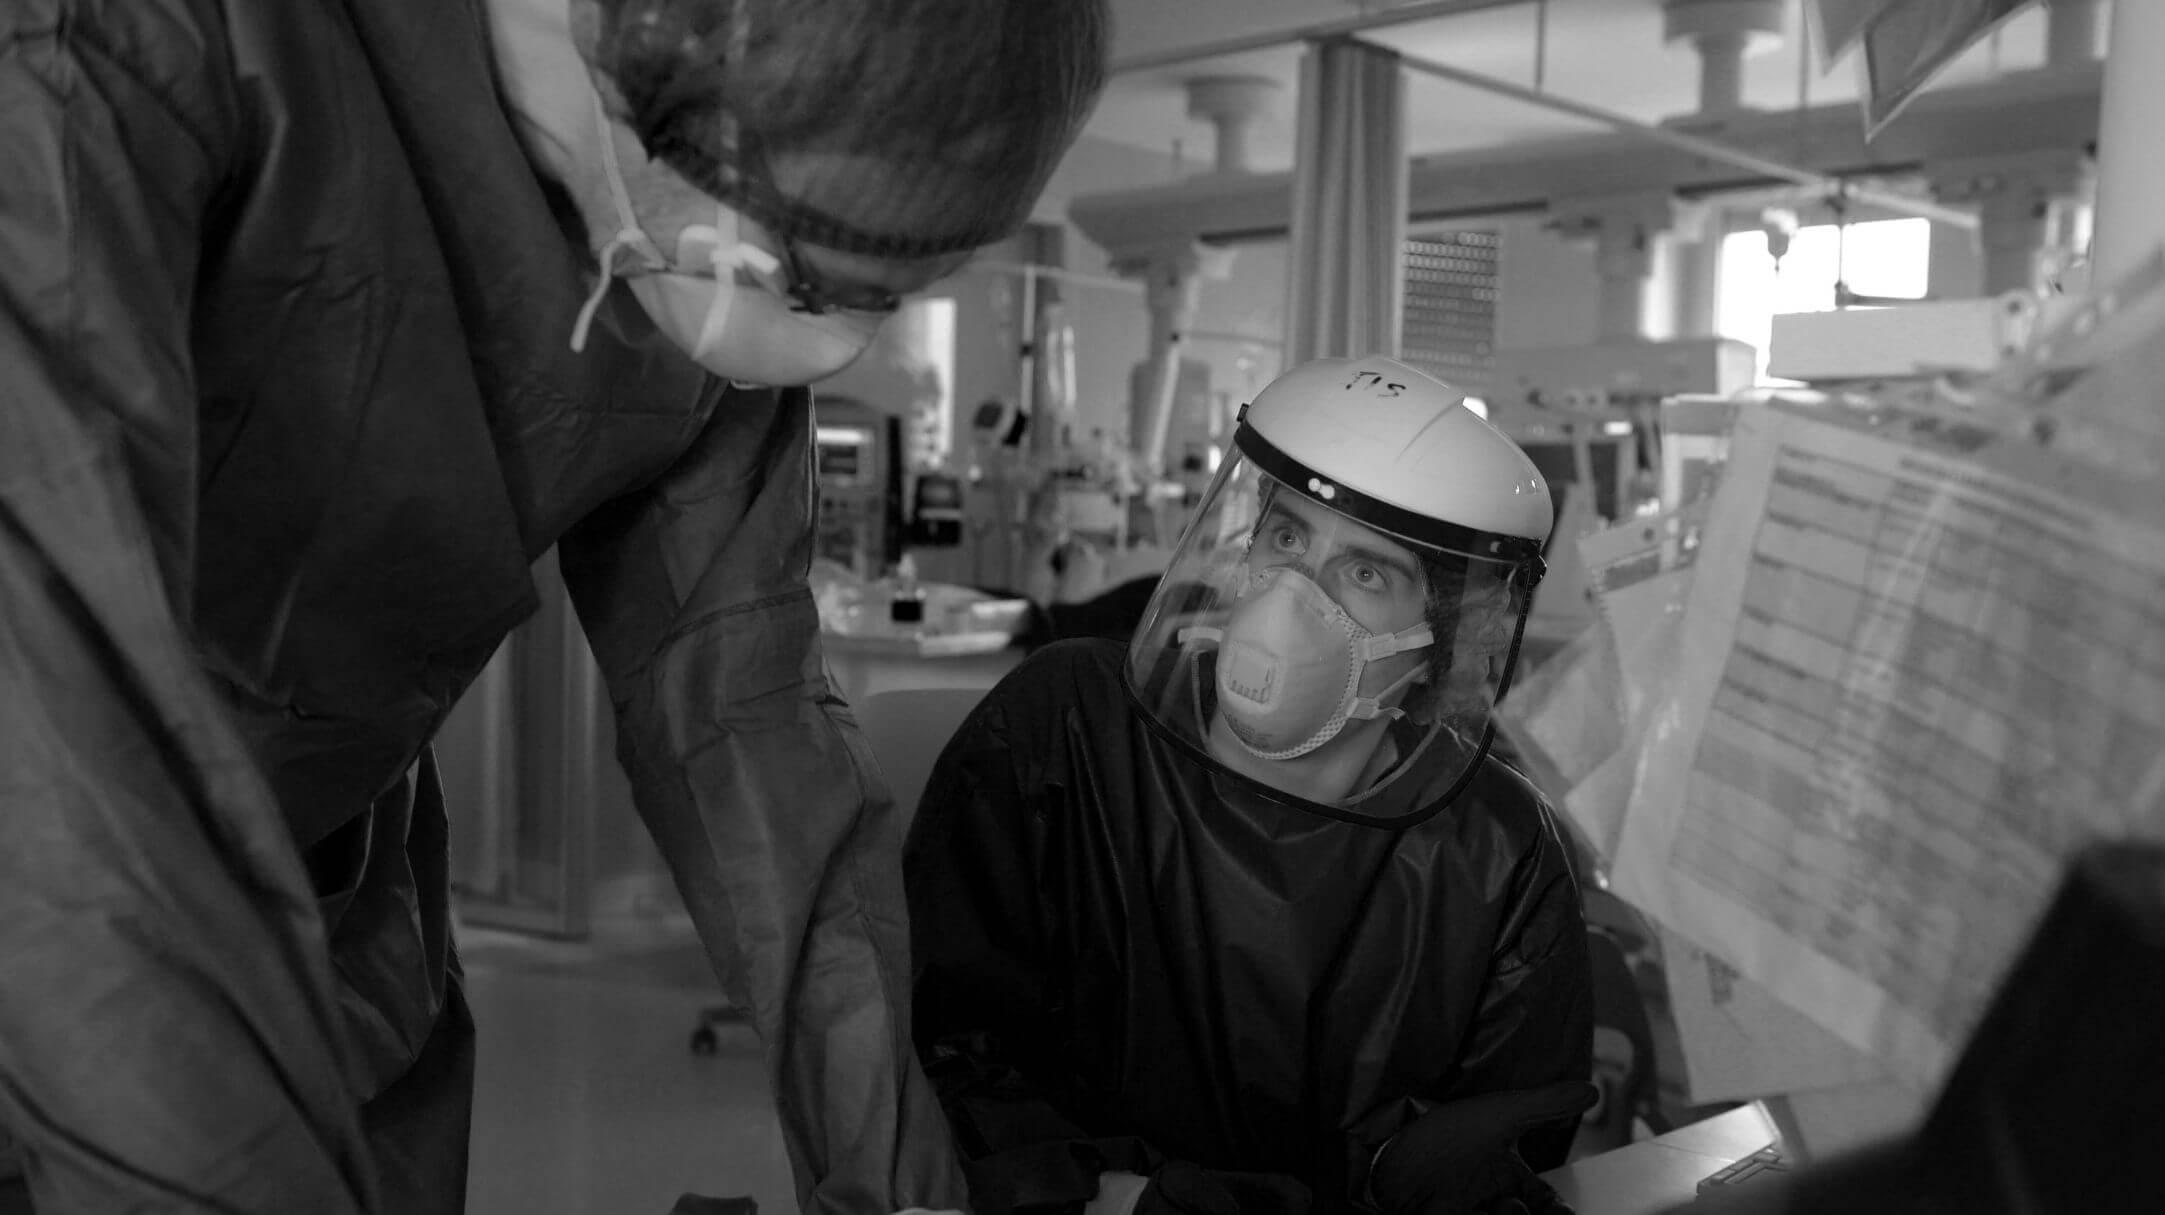 Italia, Lodi: Operatori sanitari